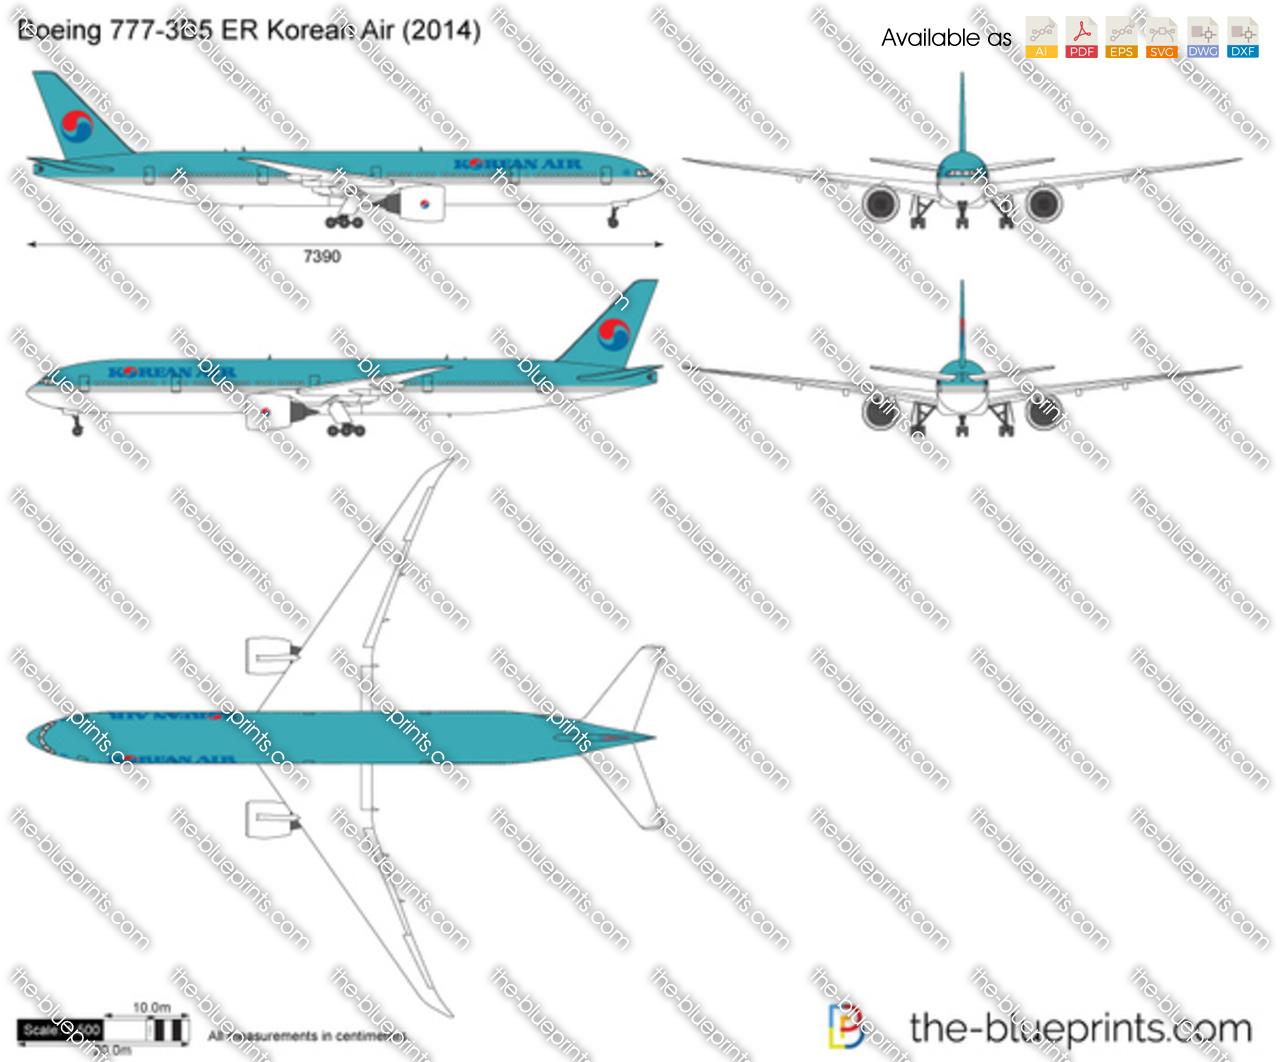 Boeing 777-3B5 ER Korean Air 2015